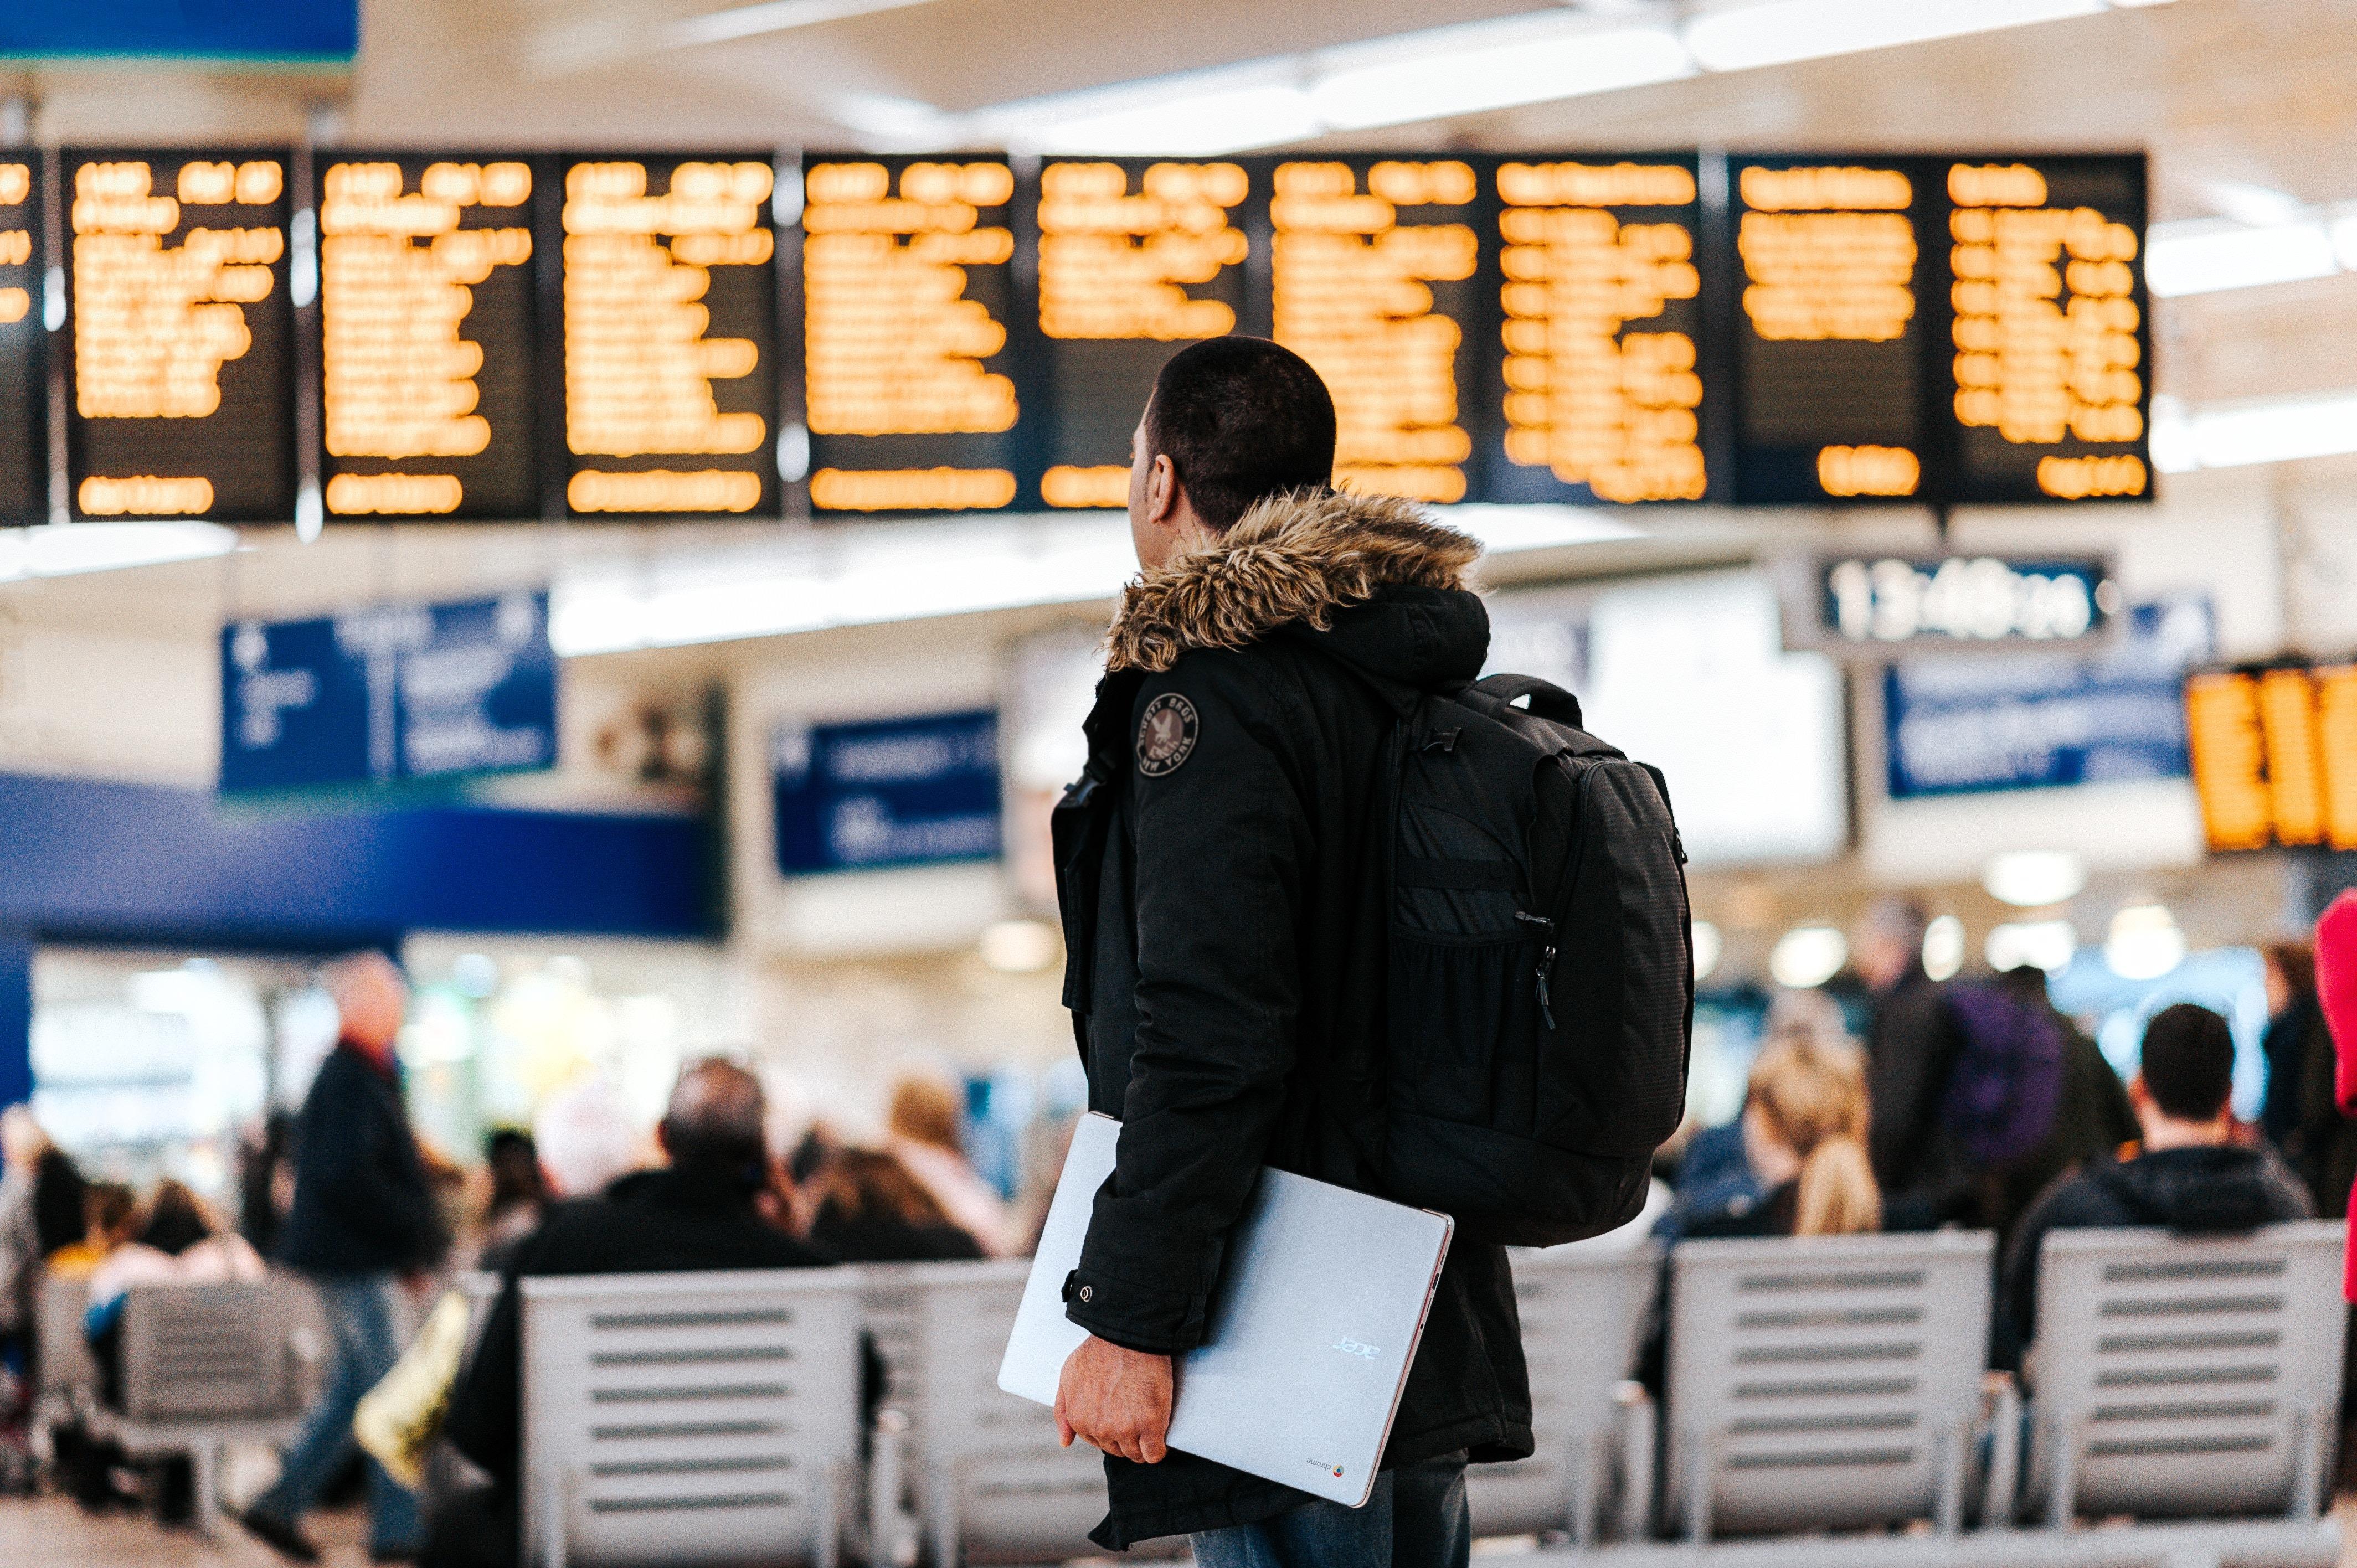 Photo of بیمه مسافرتی کانادا ، فرانسه ، گرجستان و تایلند چه تفاوتی با یکدیگر دارد؟